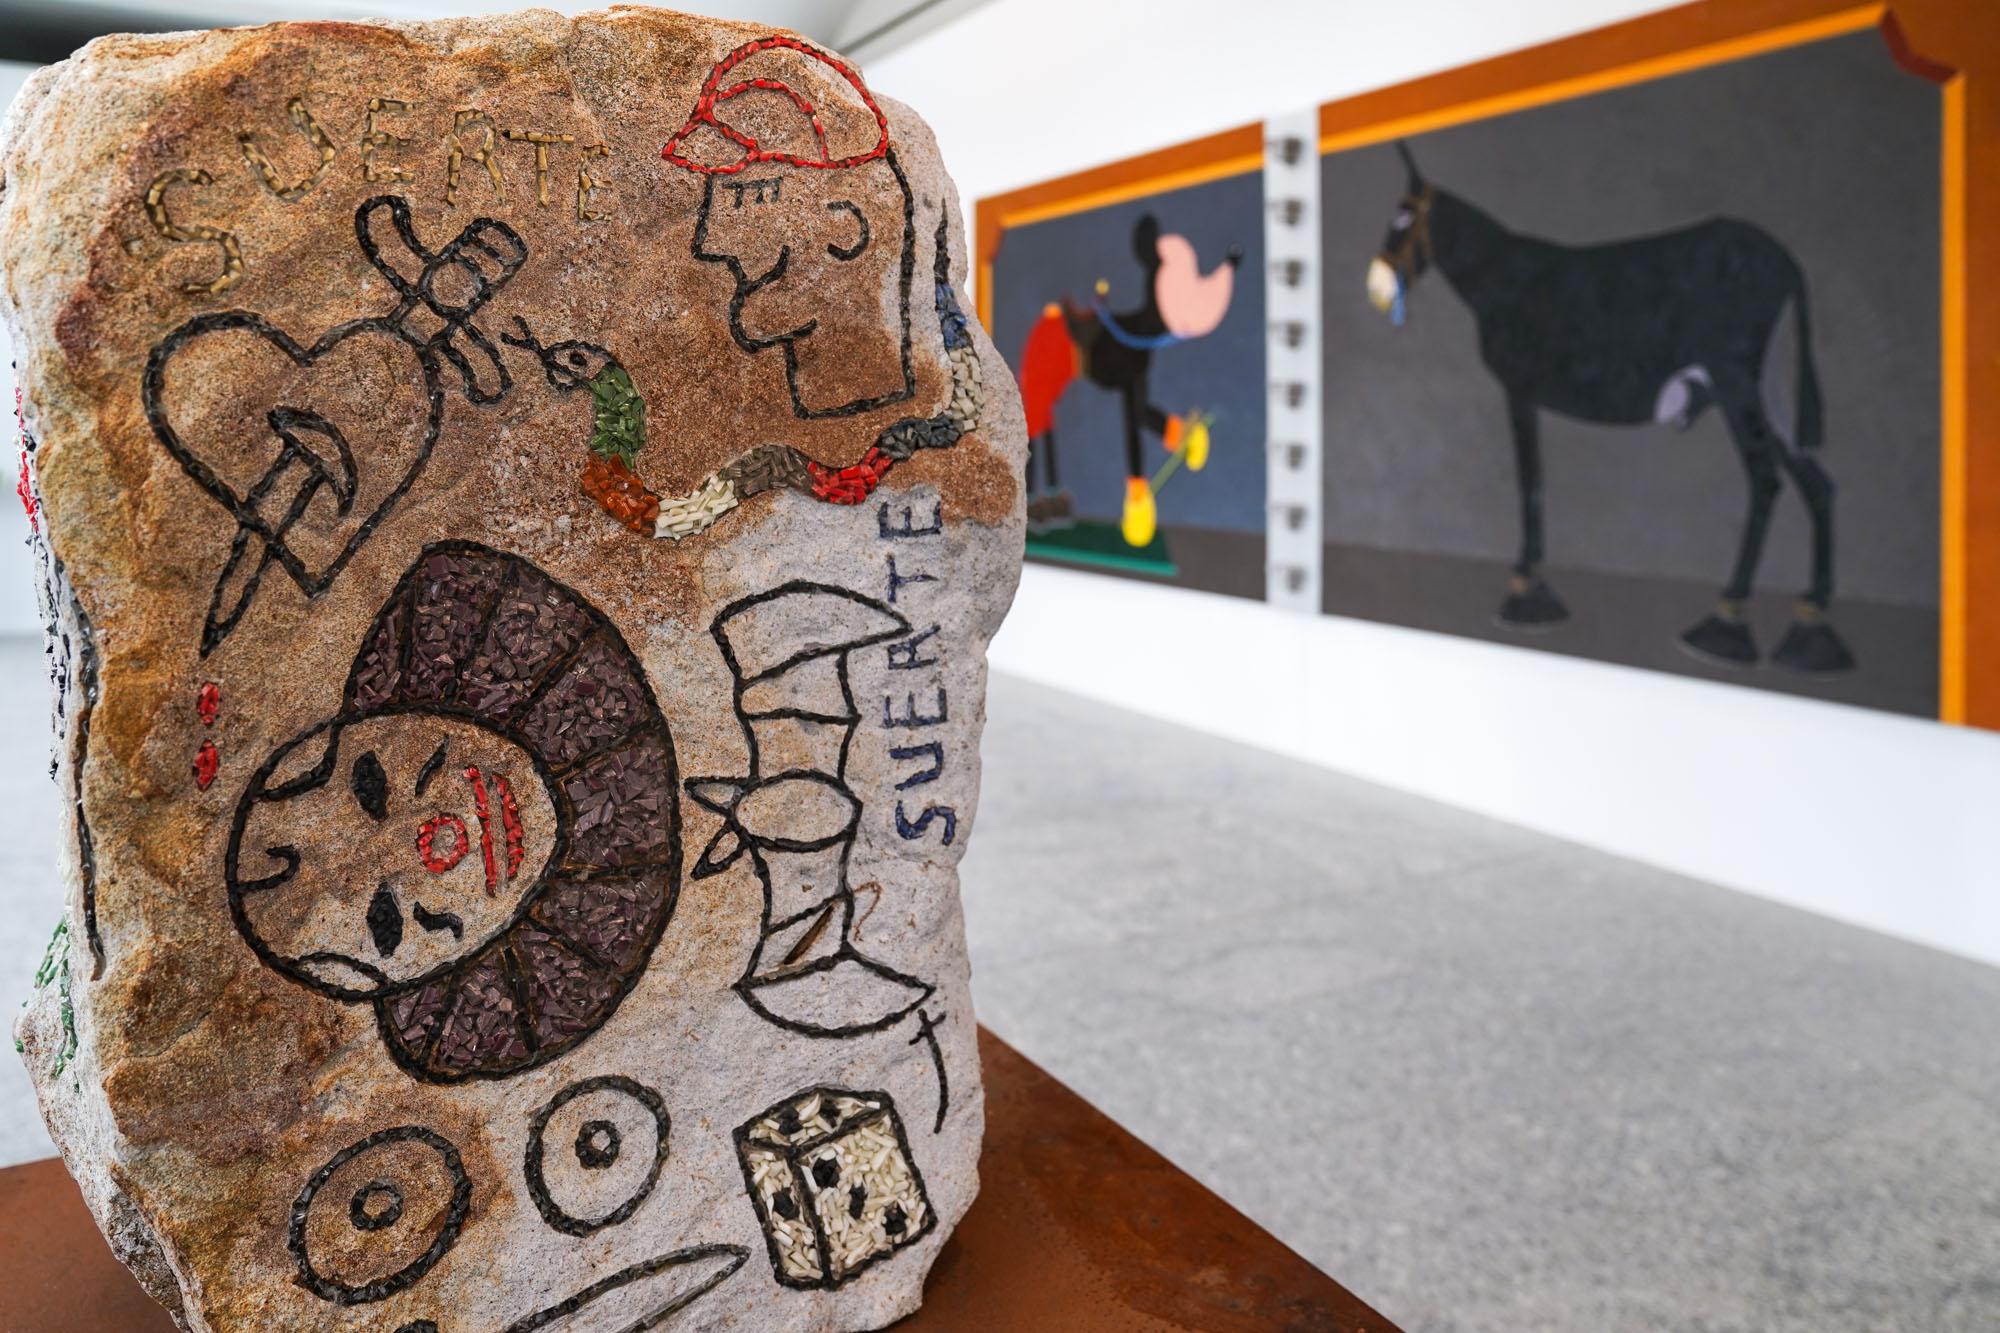 CaballeroCosmica-ExhibitionsPhoto-EduardoArroyo-19.jpg